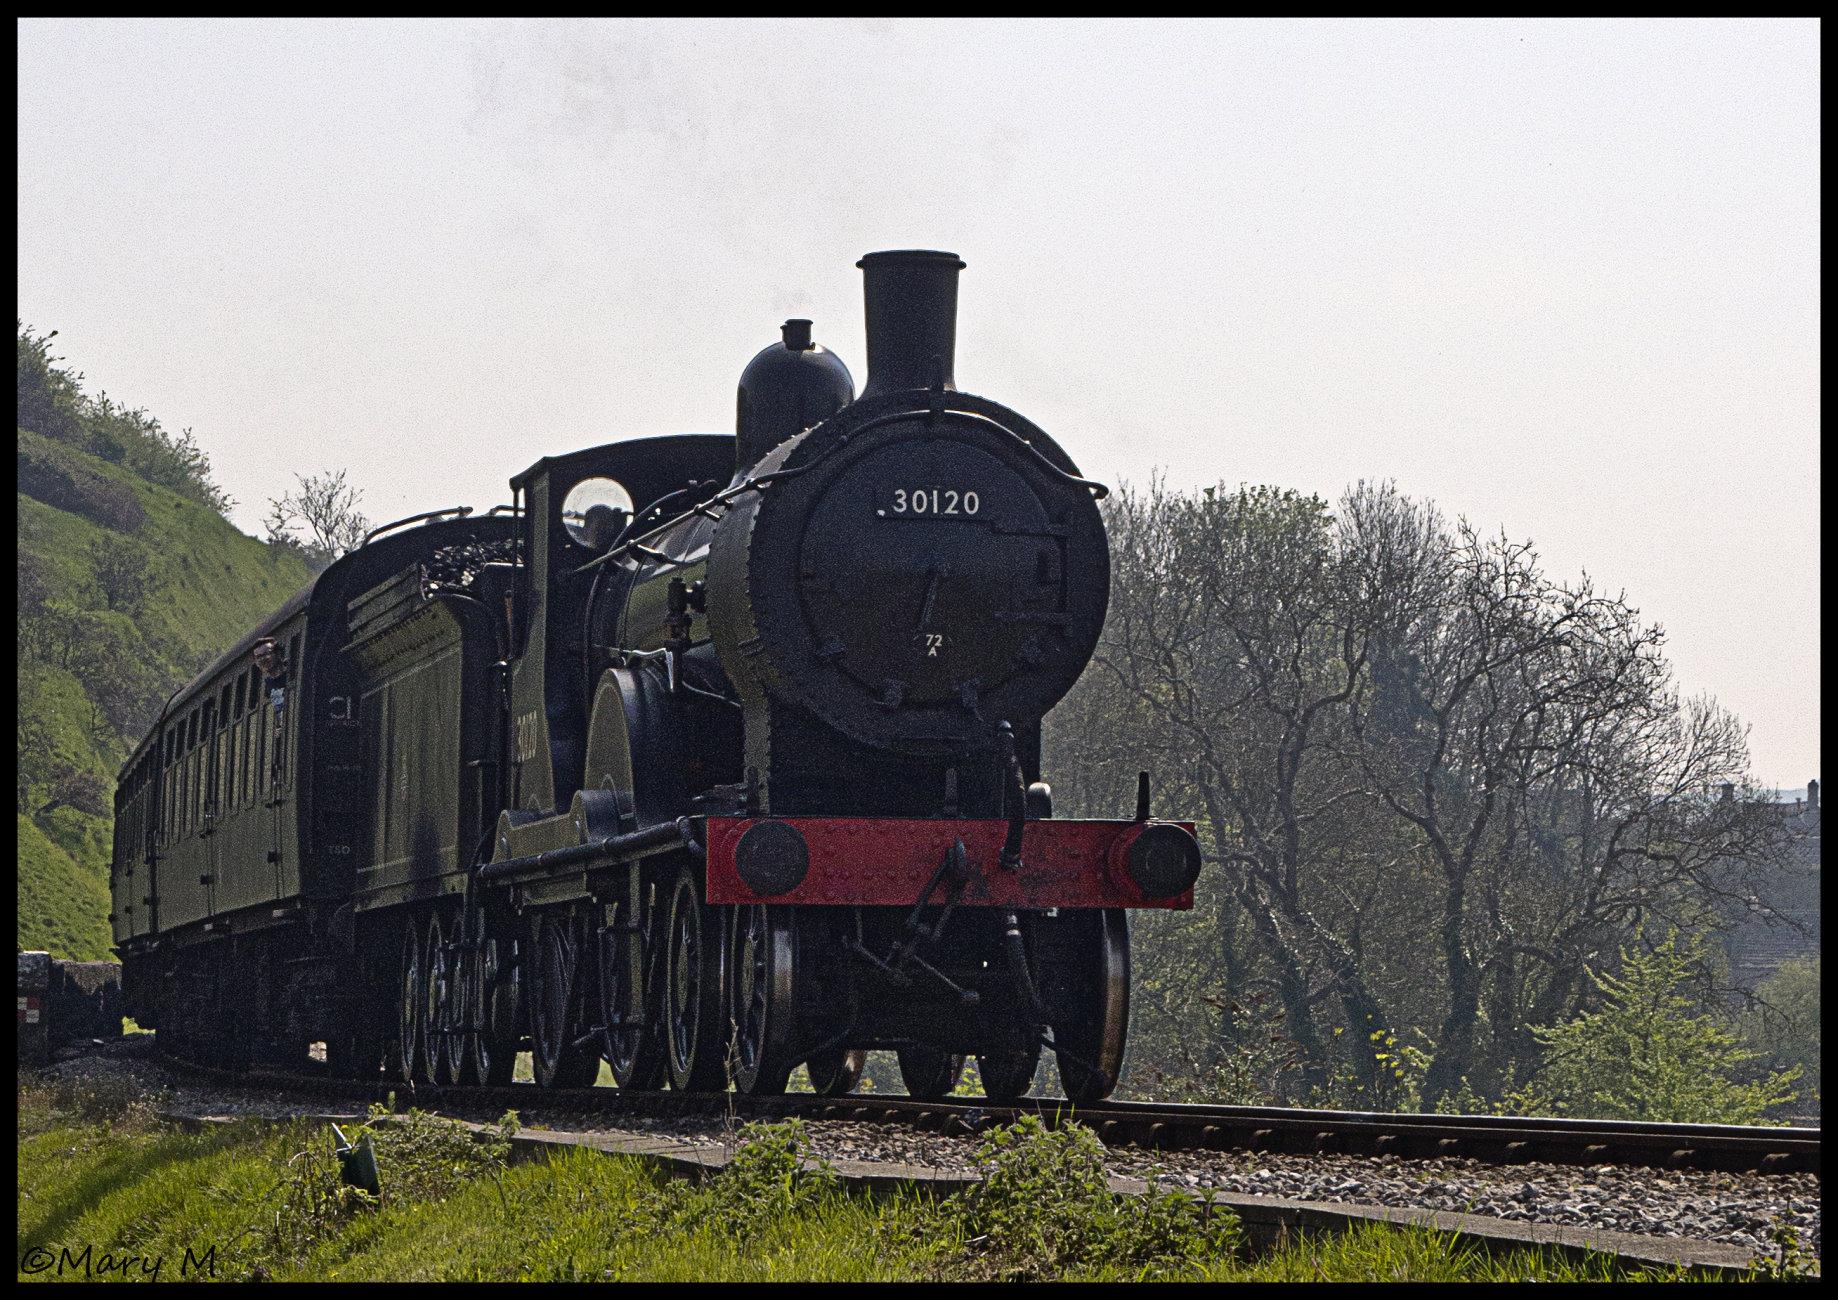 Swanage Railway